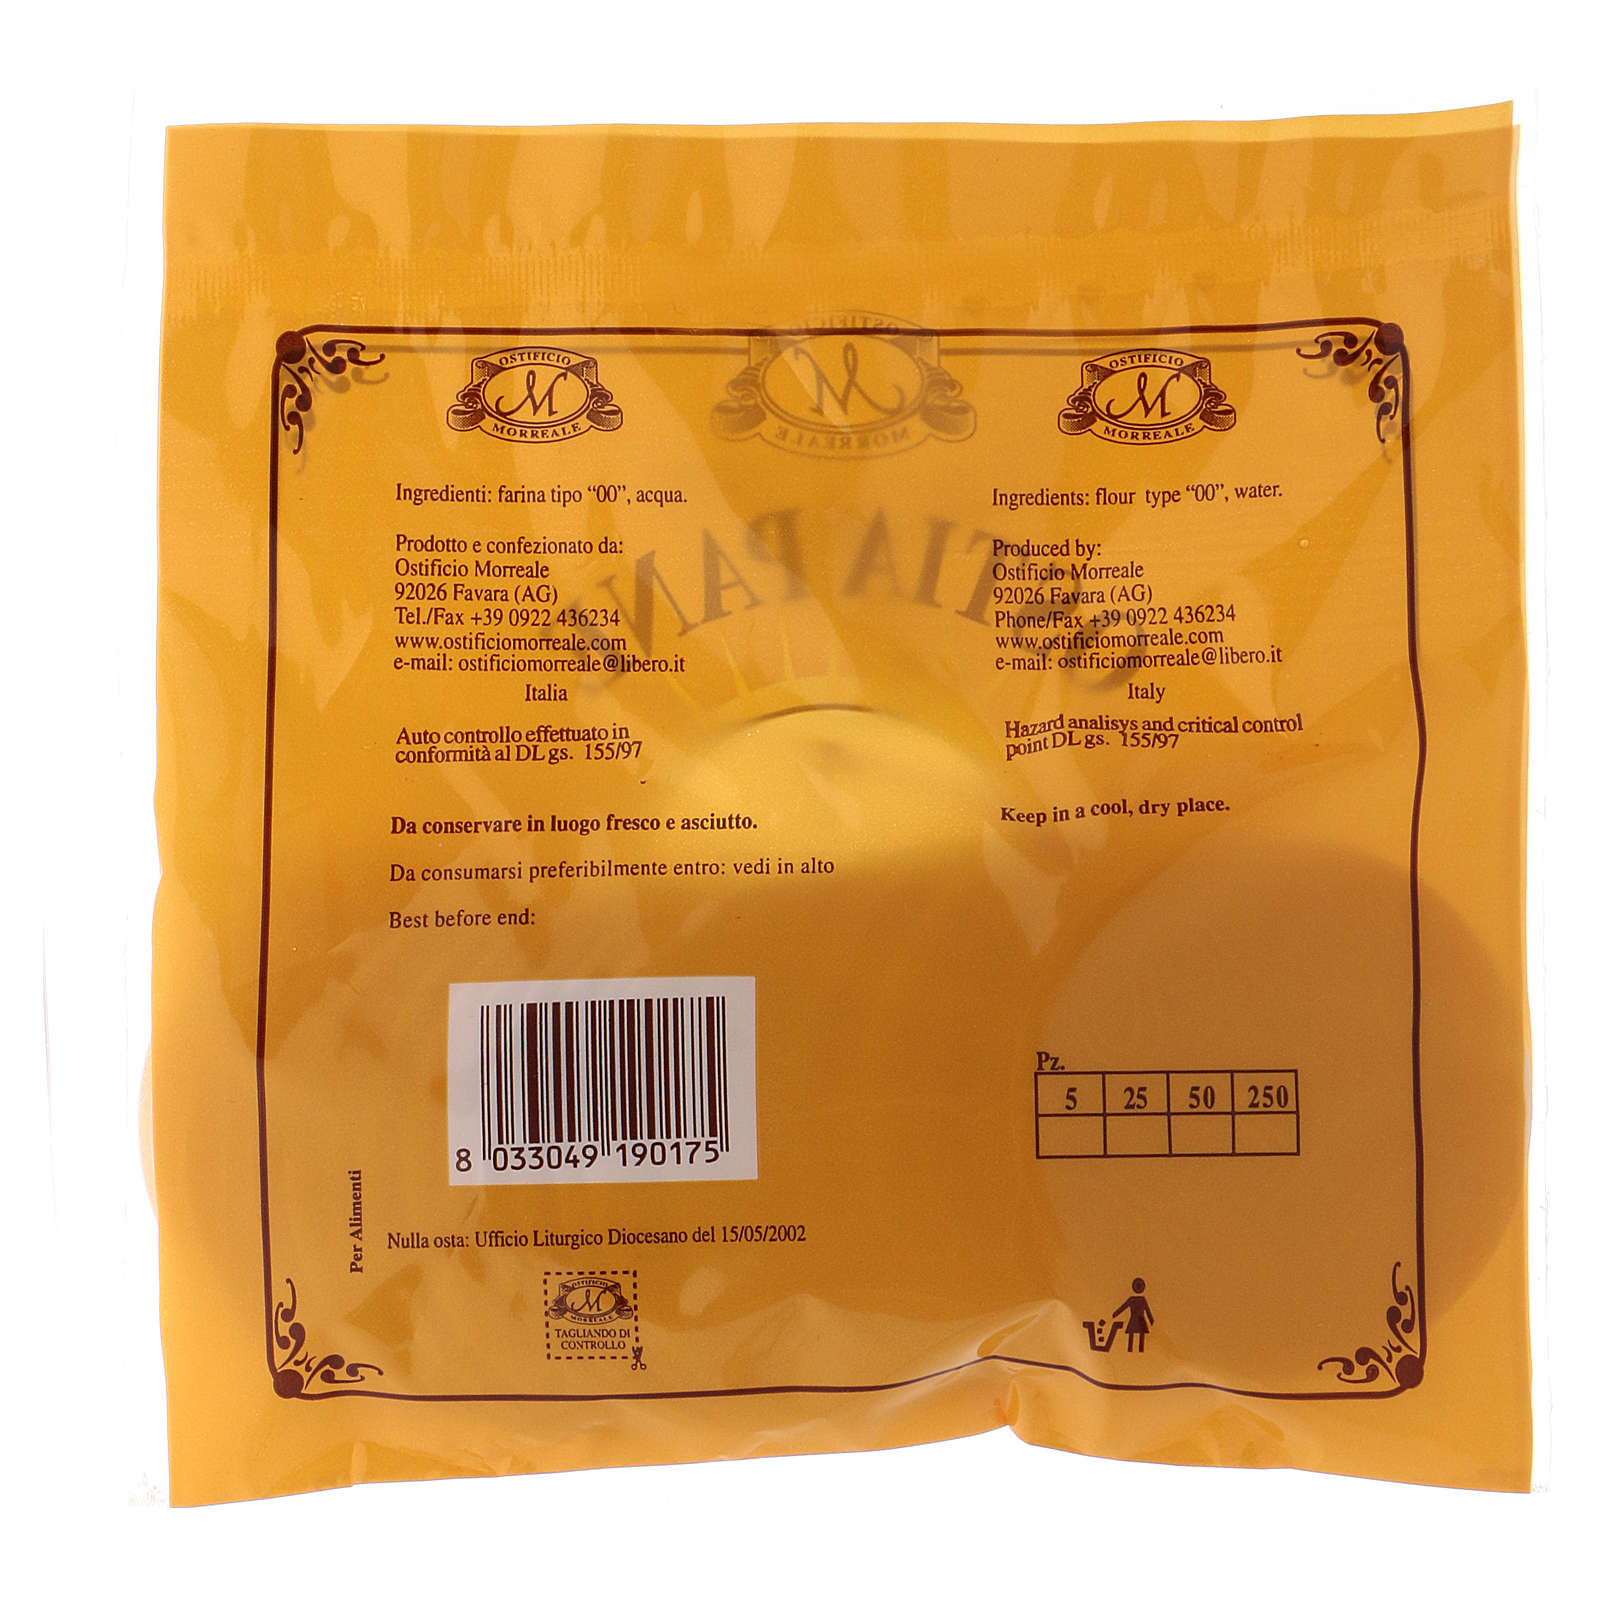 Thick altar bread 7.5 cm diameter 25 pcs bag 3